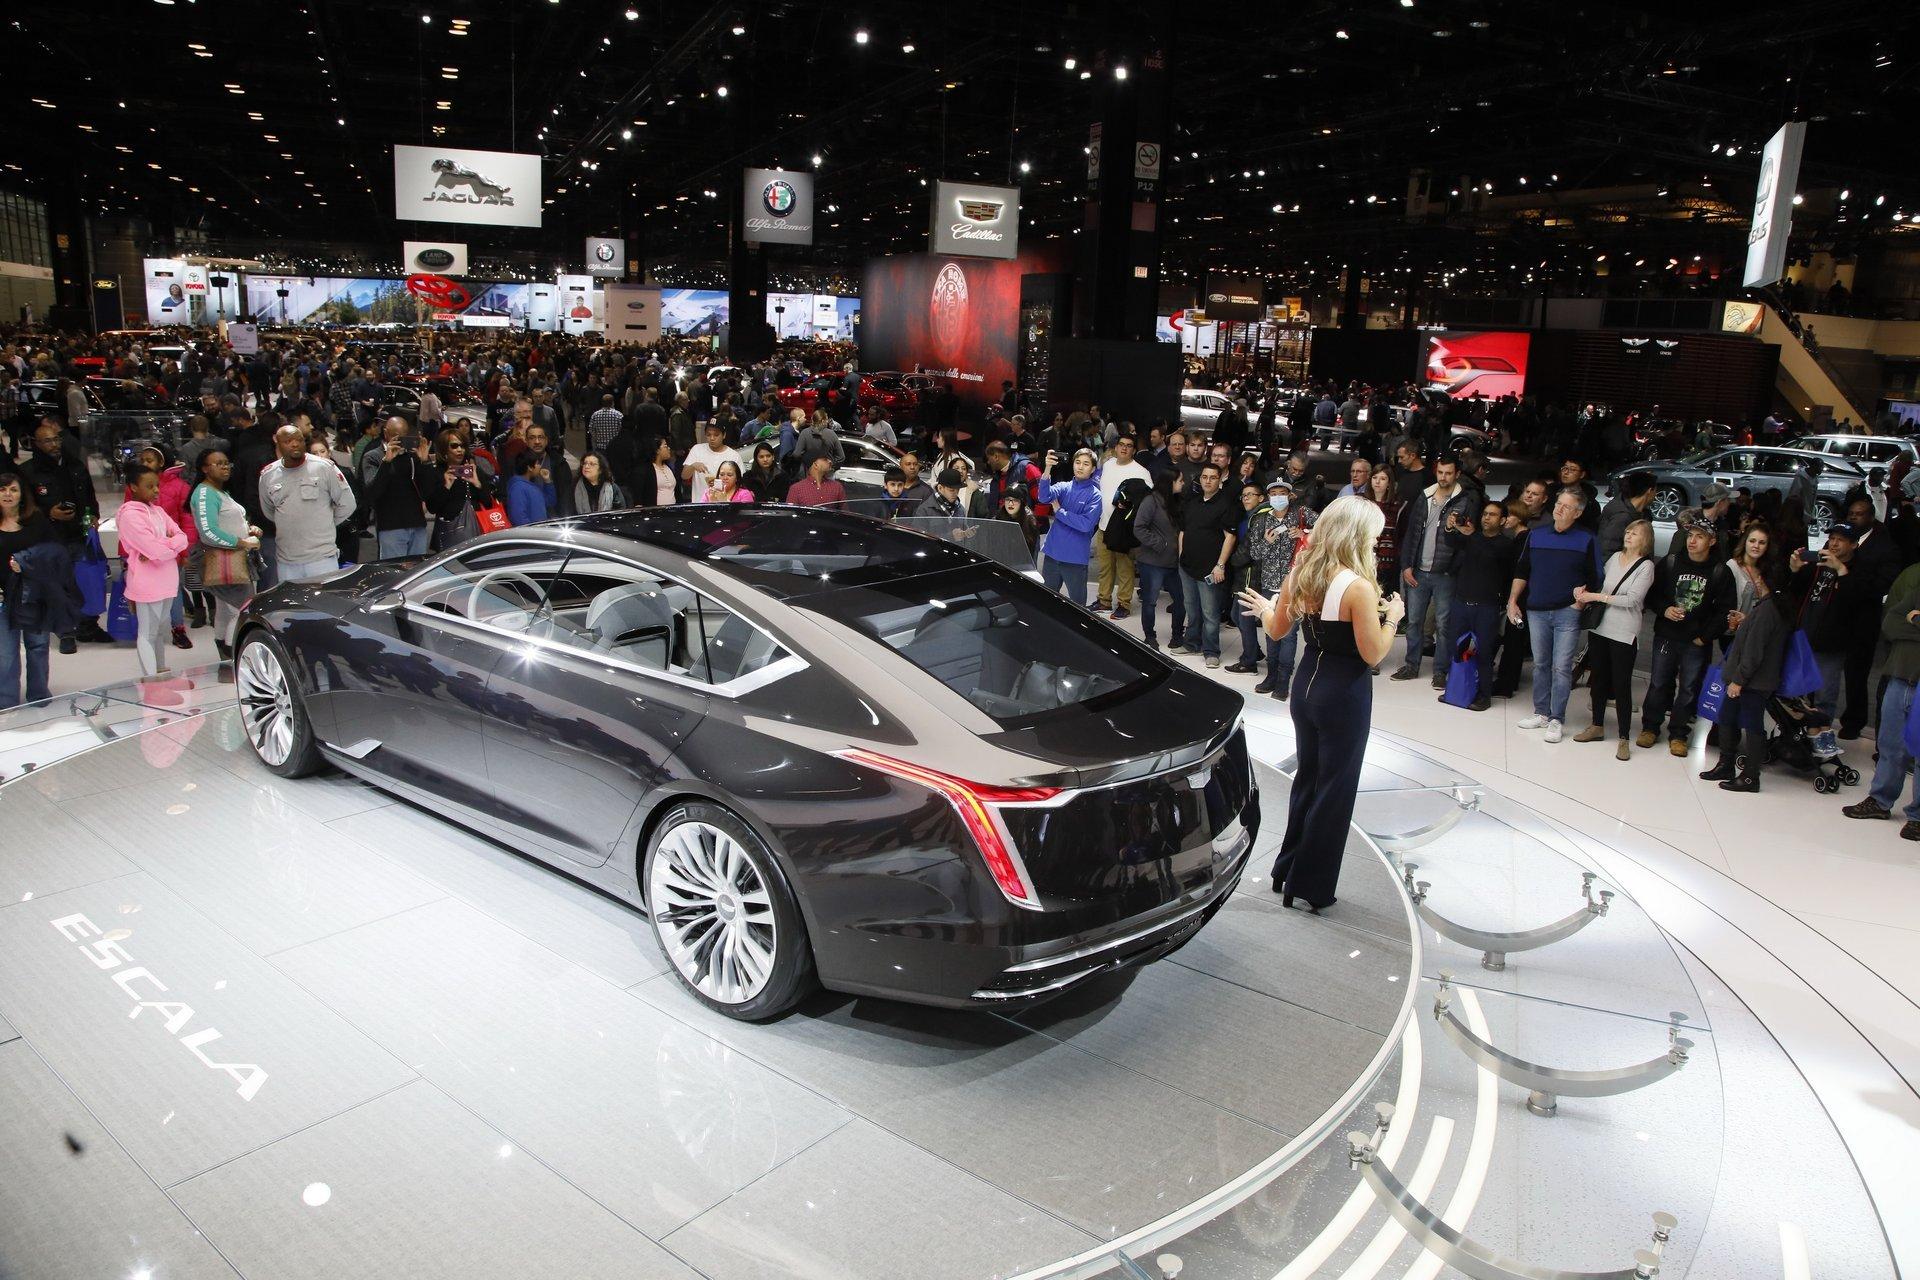 Auto Show 2020 Chicago.Chicago Auto Show 2020 Dates Map